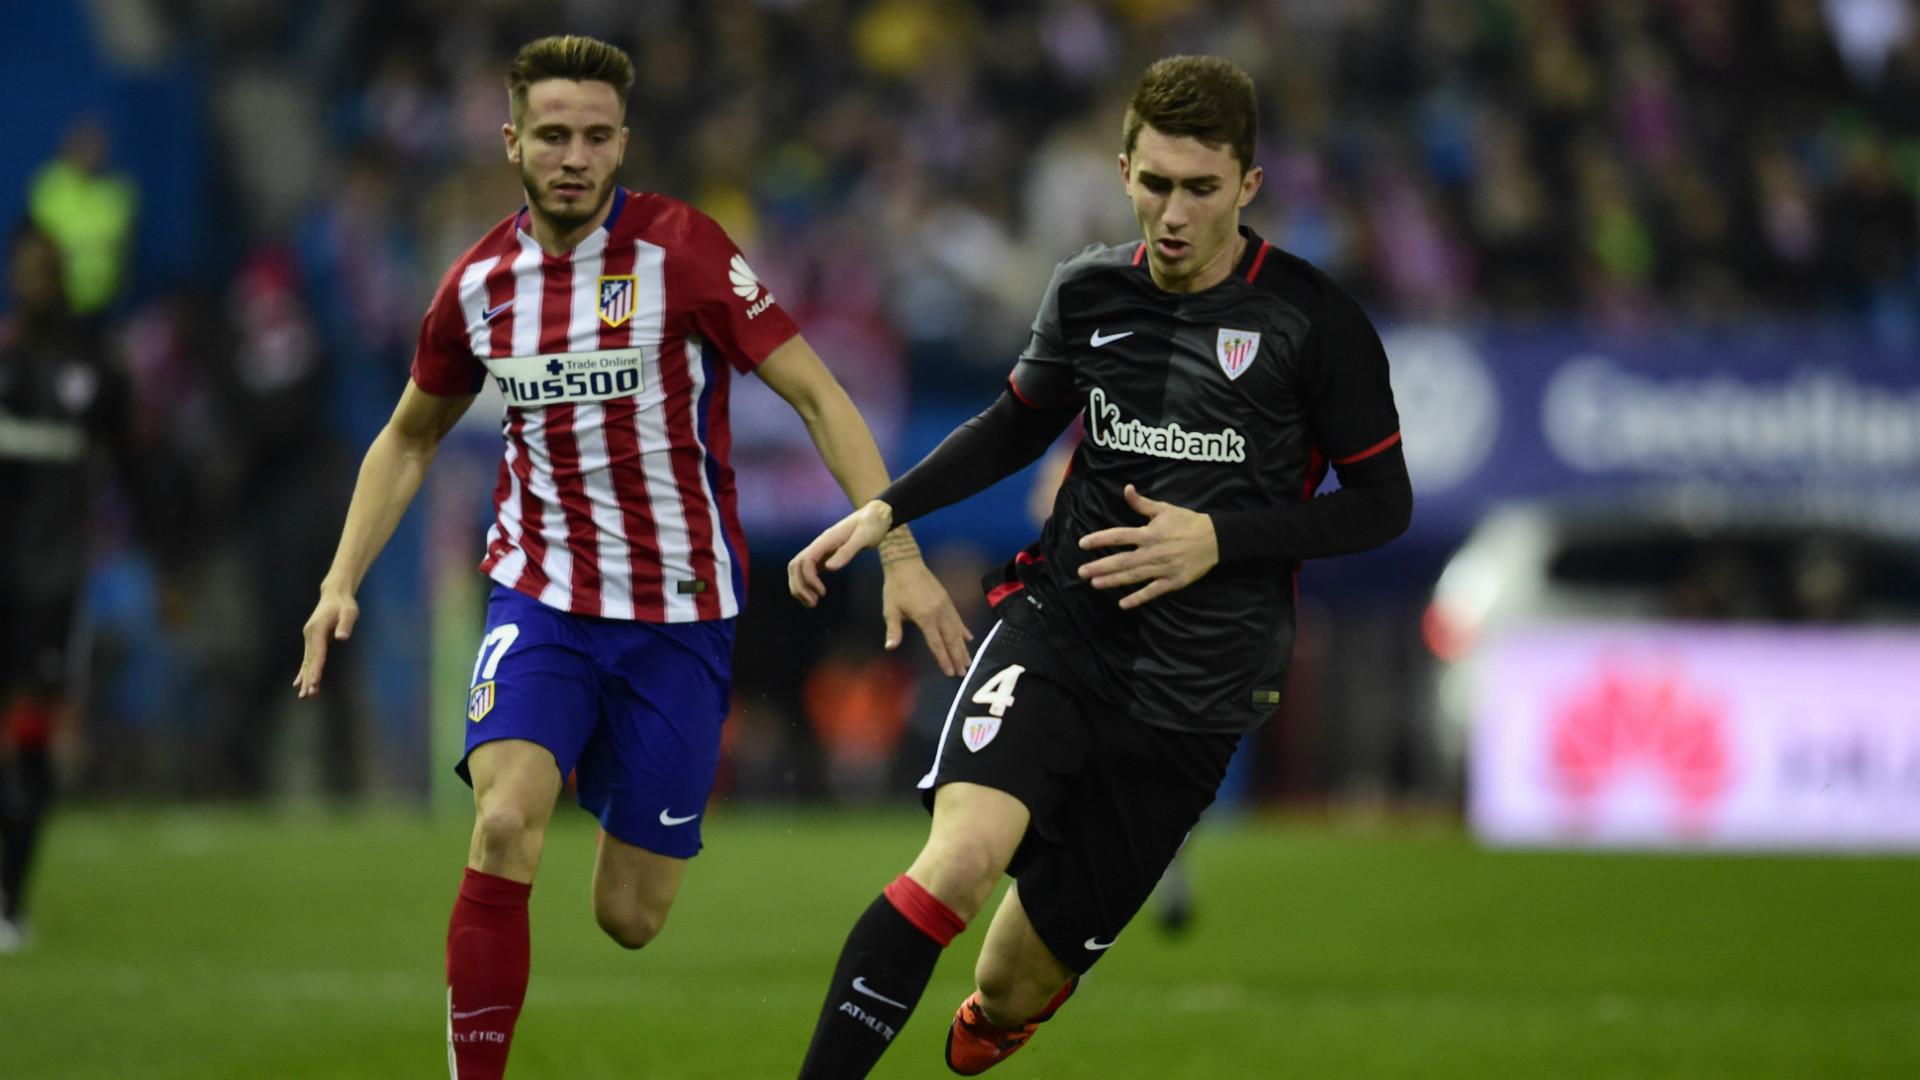 Video: Atletico Madrid vs Athletic Bilbao